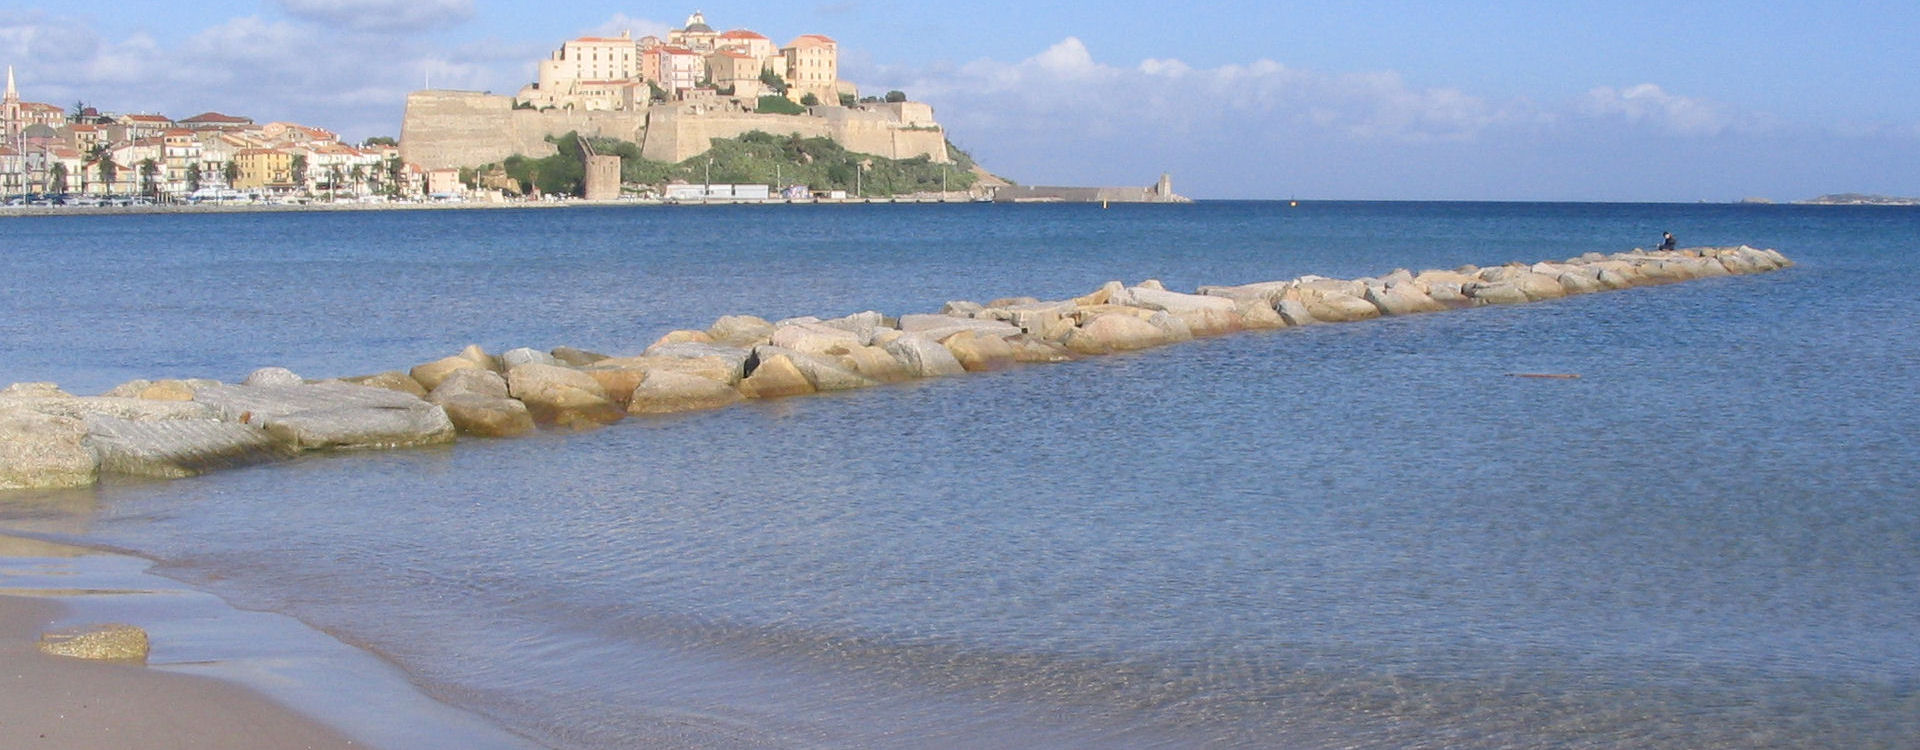 calvi-citadelle-plage-mer